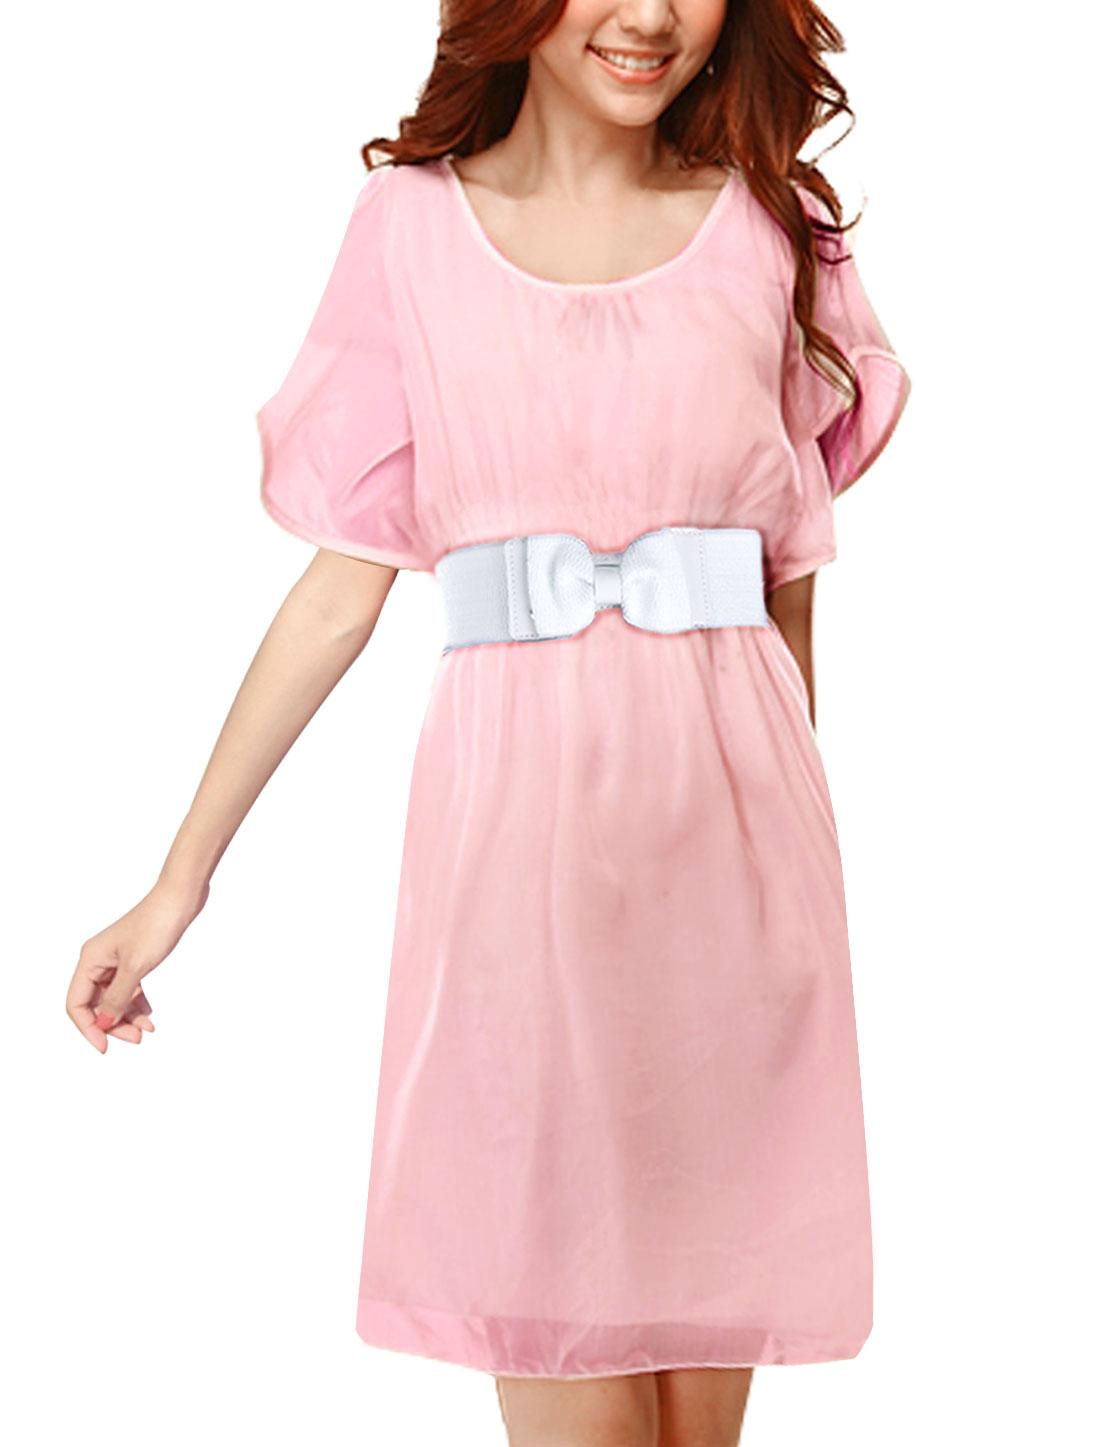 Stylish Ladies Pink Elastic Waist Above Knee Dress w Bowtie Decor Belt L